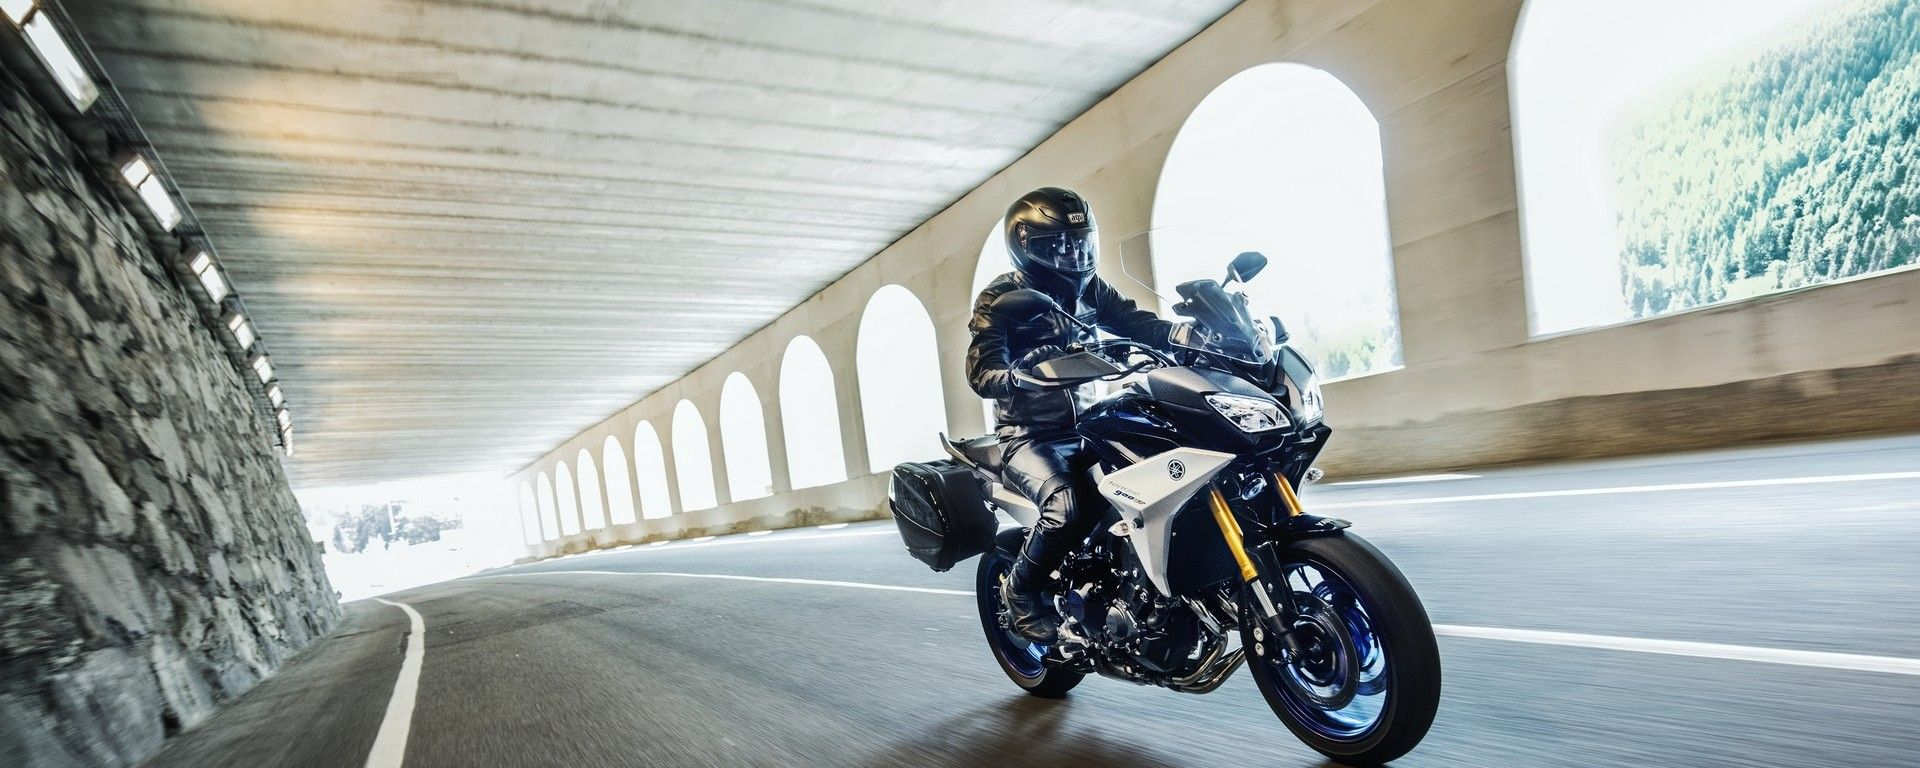 Yamaha Tracer 900 e GT ecco svelati i prezzi